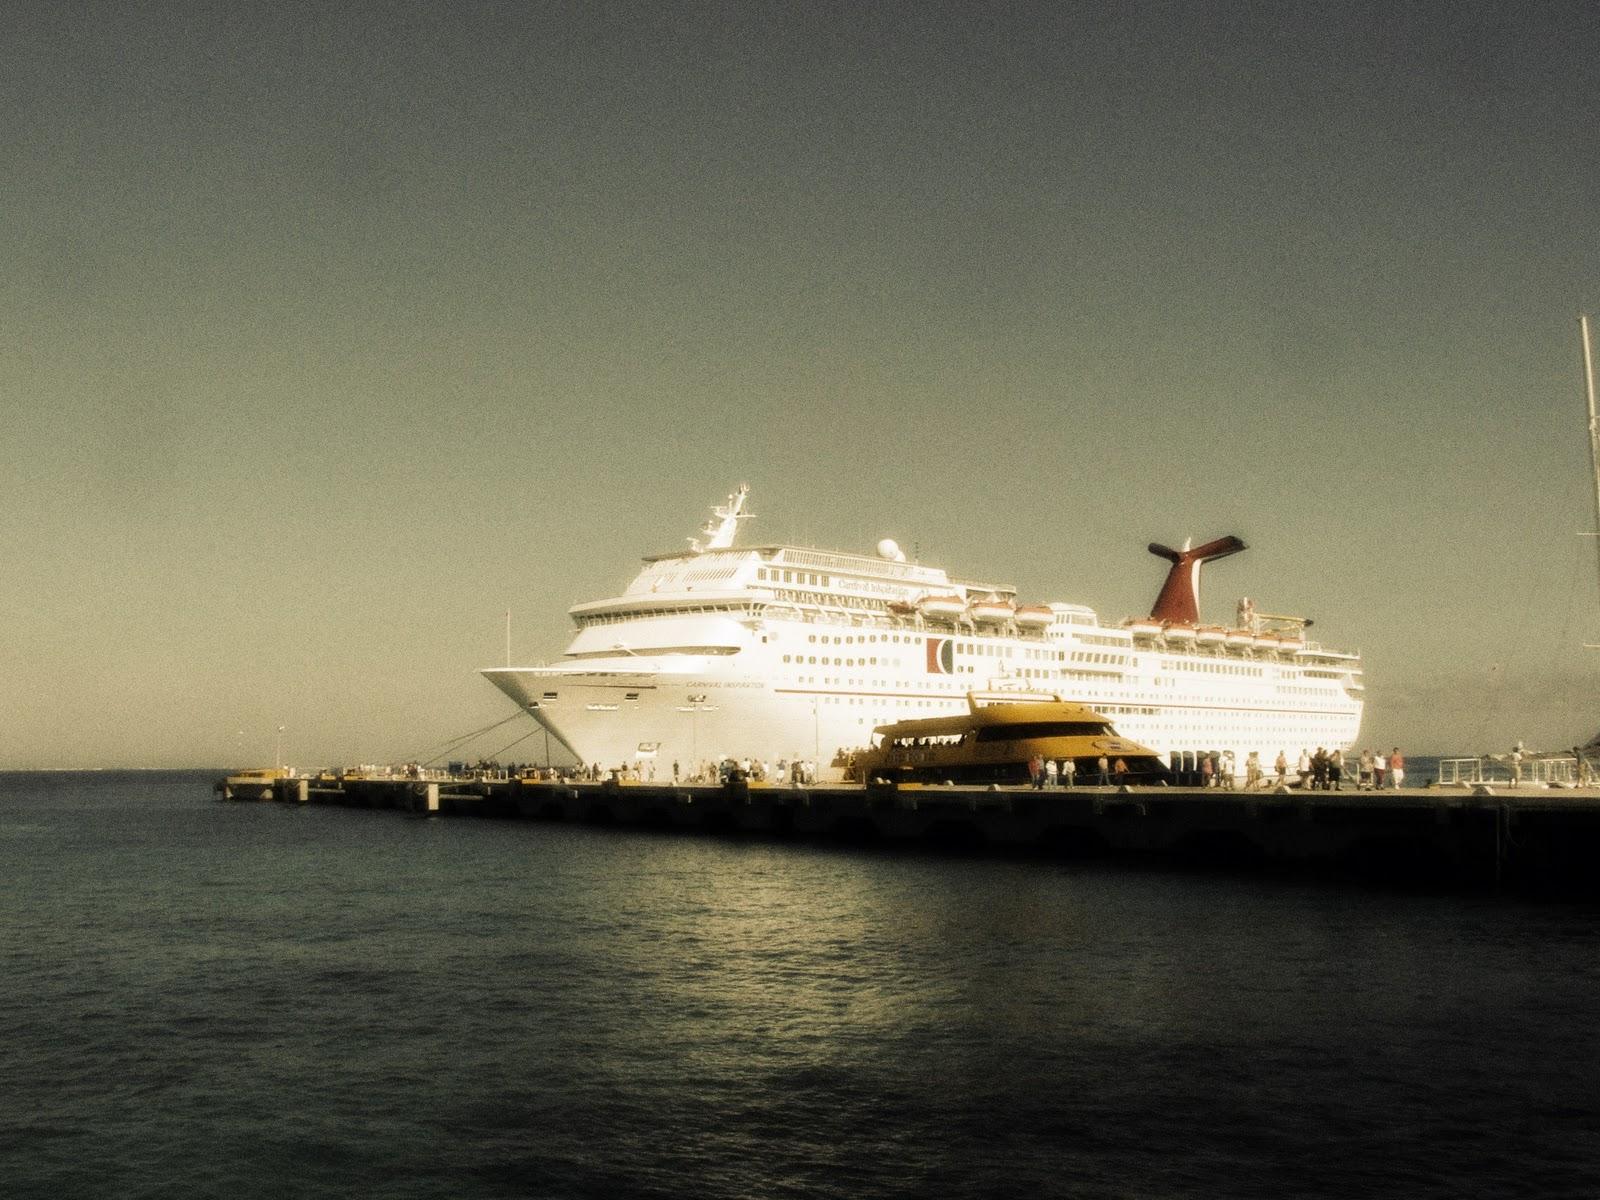 http://1.bp.blogspot.com/_kMkPsXy2RCs/TMeJgXCxrYI/AAAAAAAAFc8/T1IQKyFb-cQ/s1600/cruise+ship+employment02.jpg